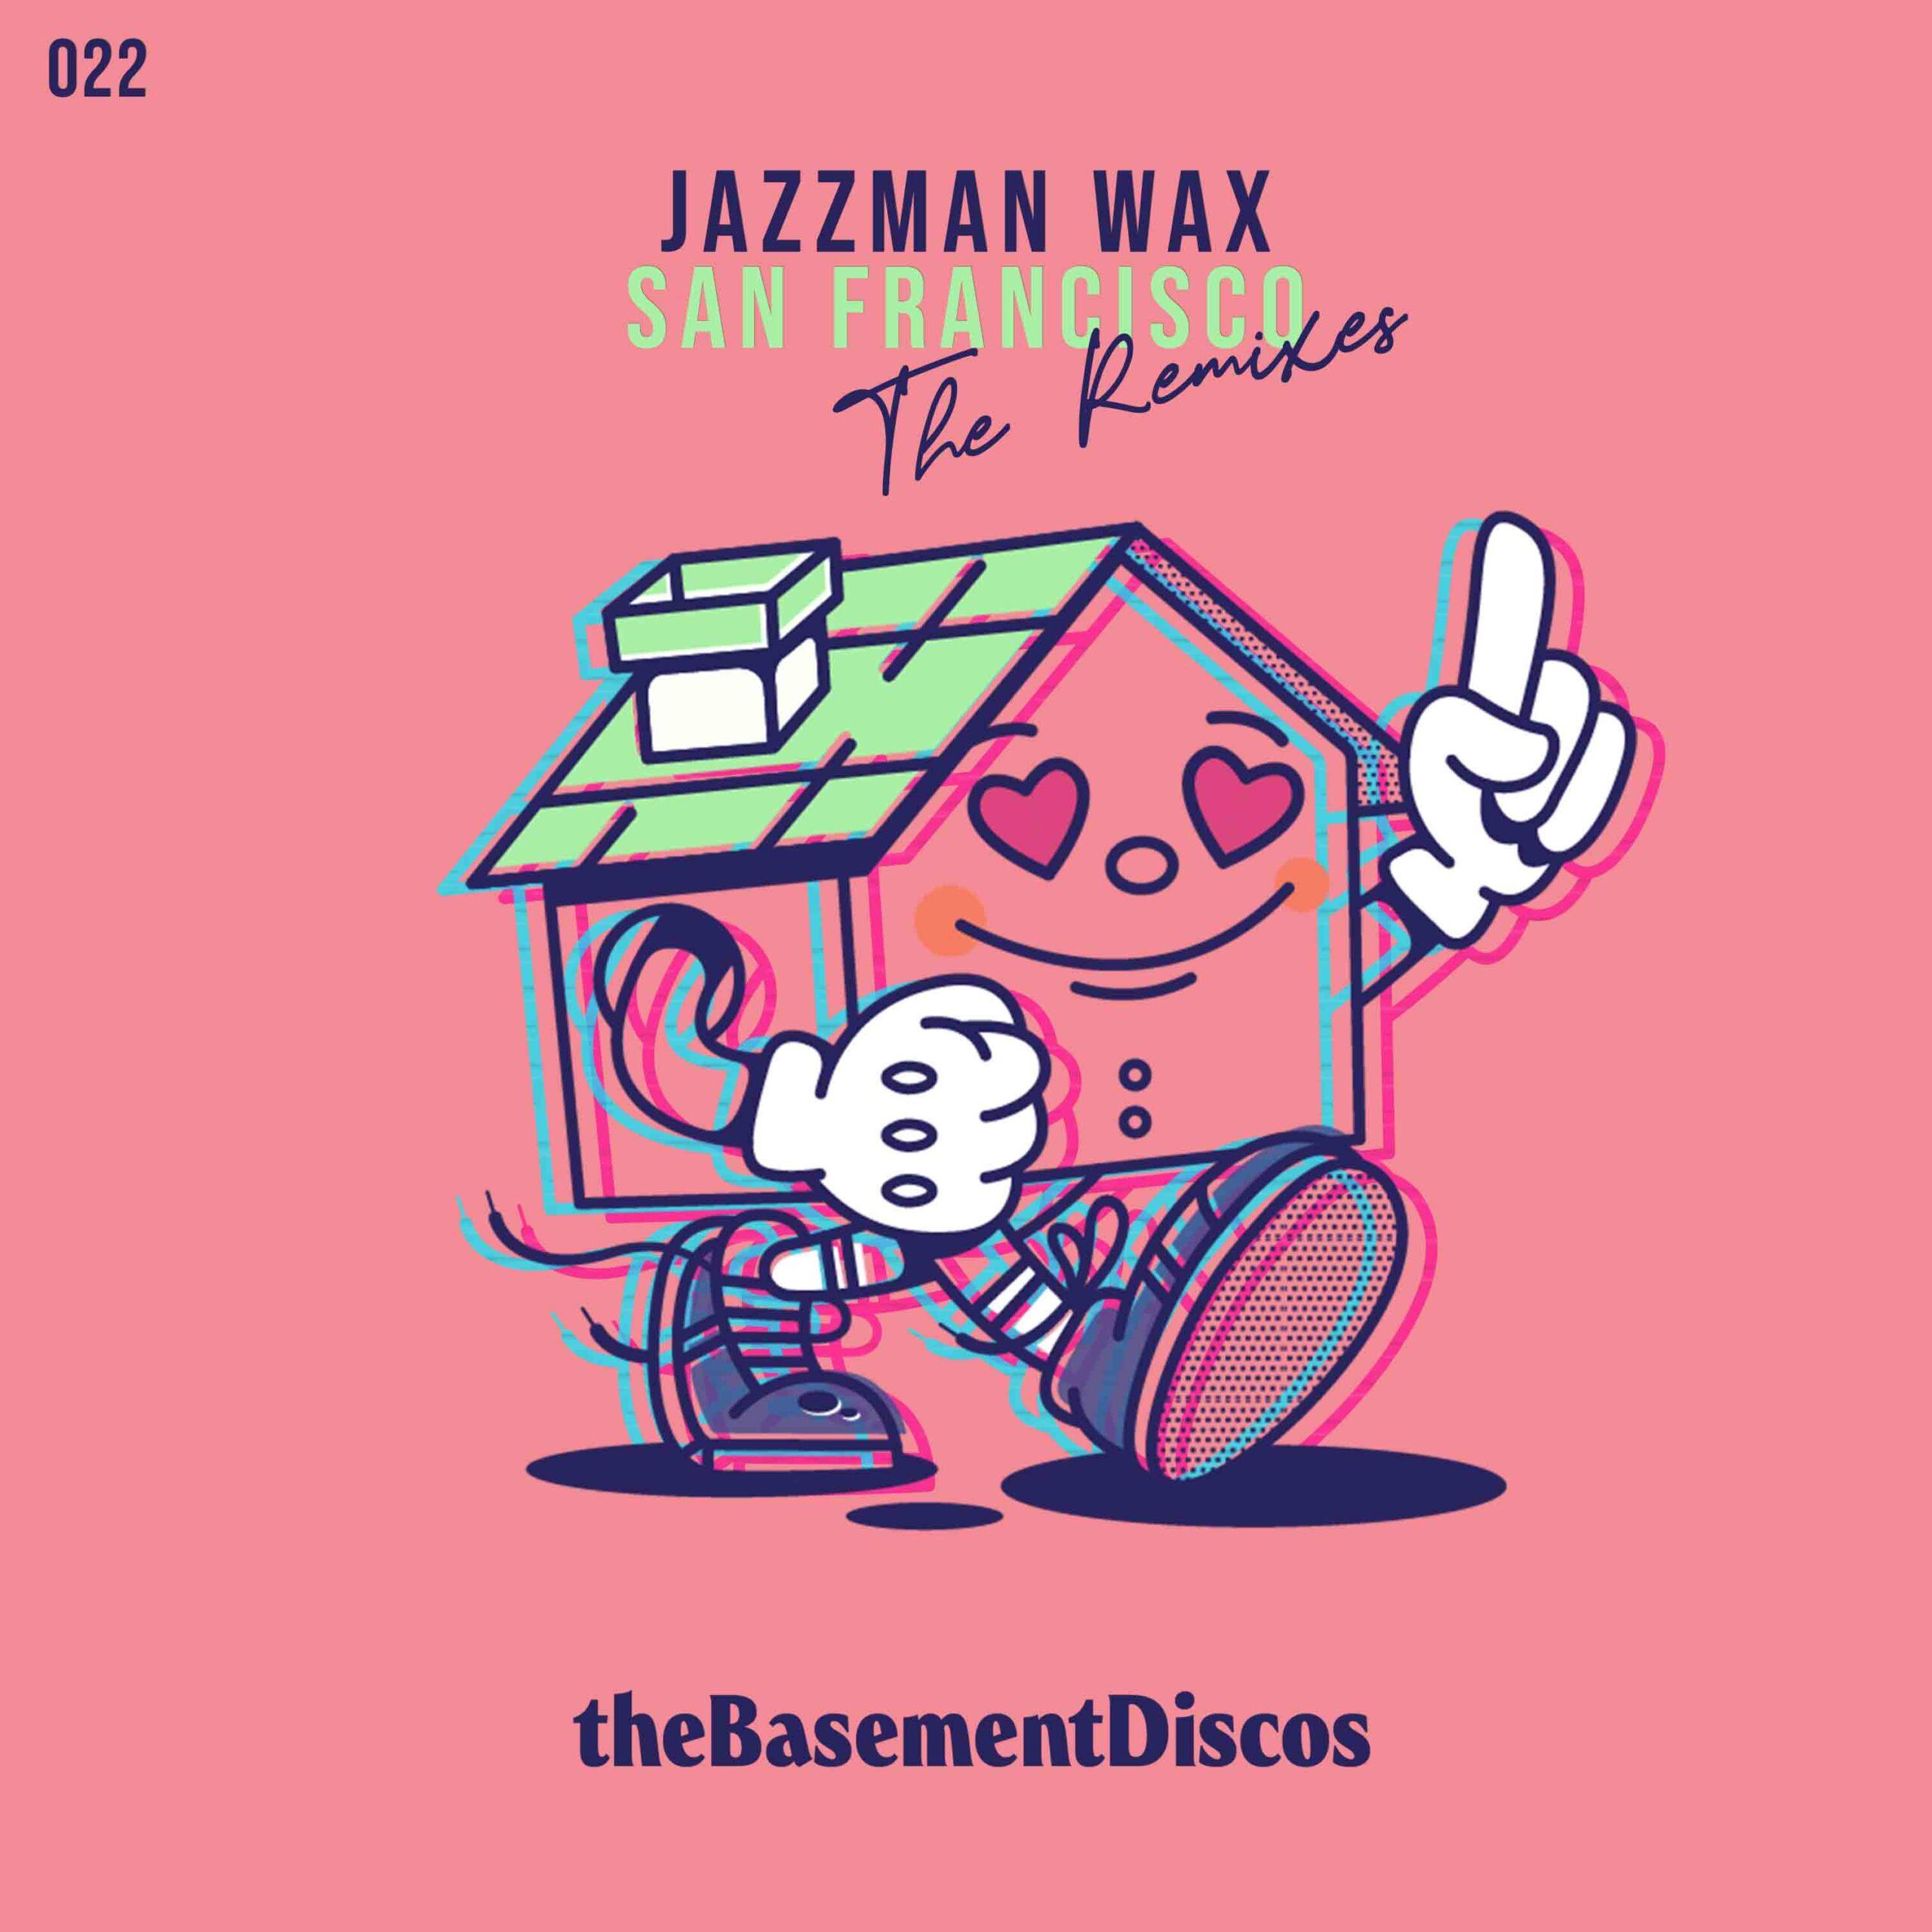 the-basement-thebasement-thebasementdiscos-jazzman-wax-san-francisco-the-remix-valencia-dj-disco-house-good-feelings-portada